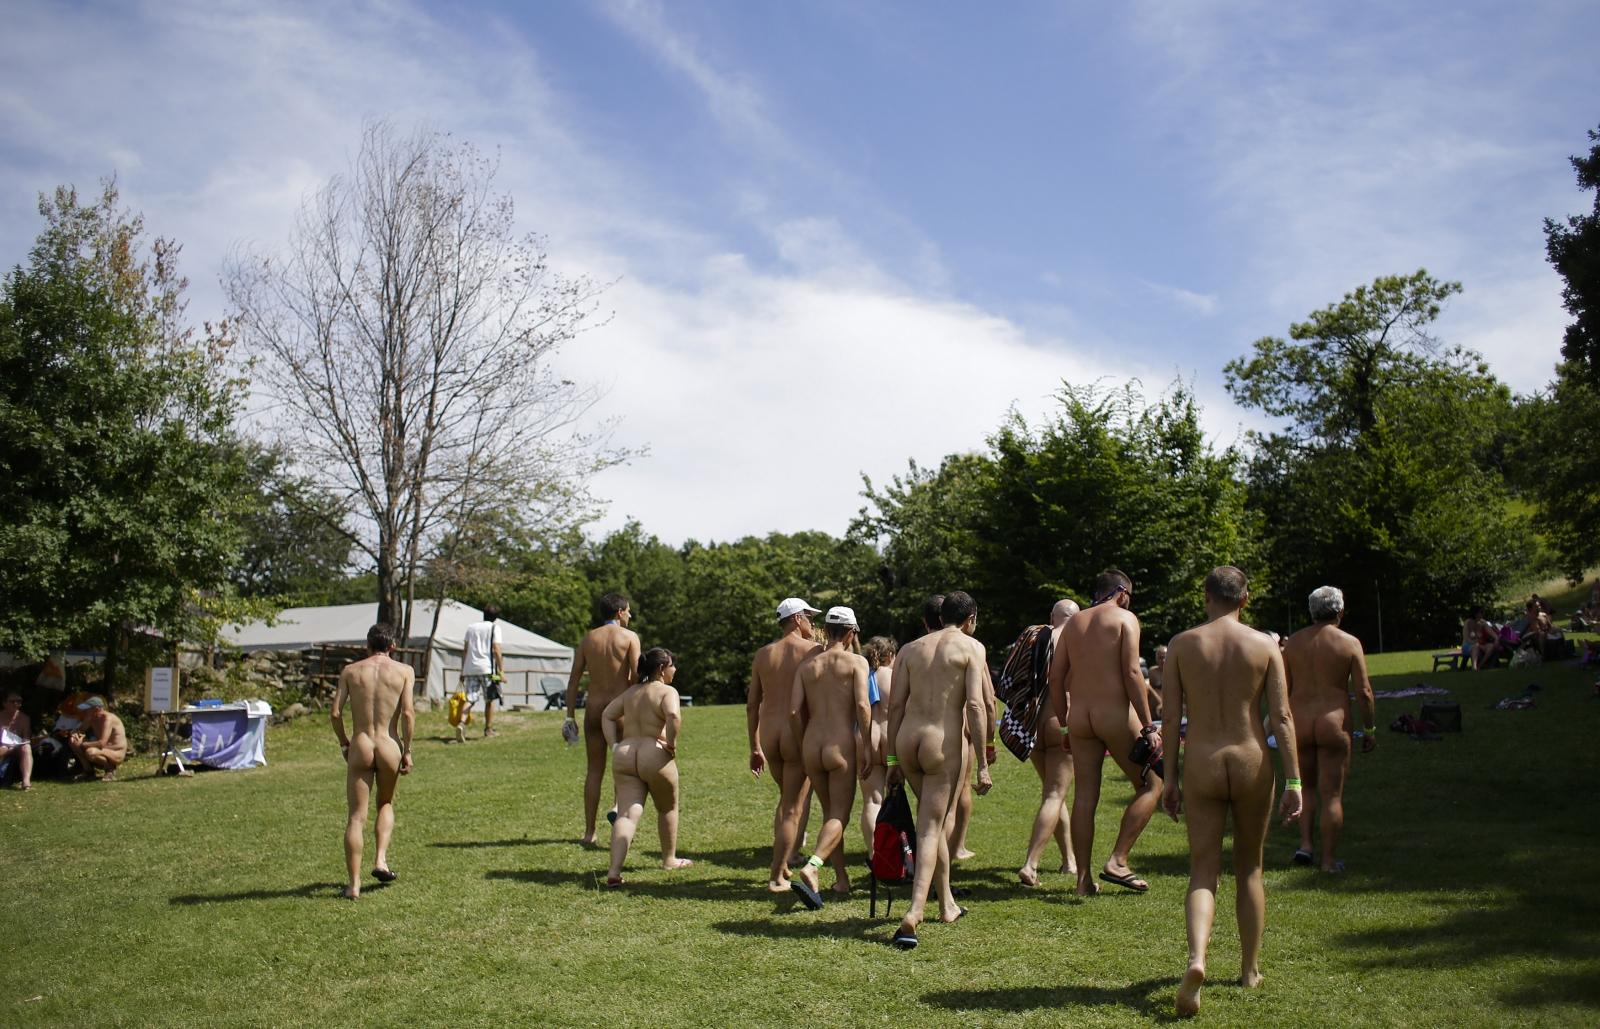 Nudists enjoy the sun in Italy